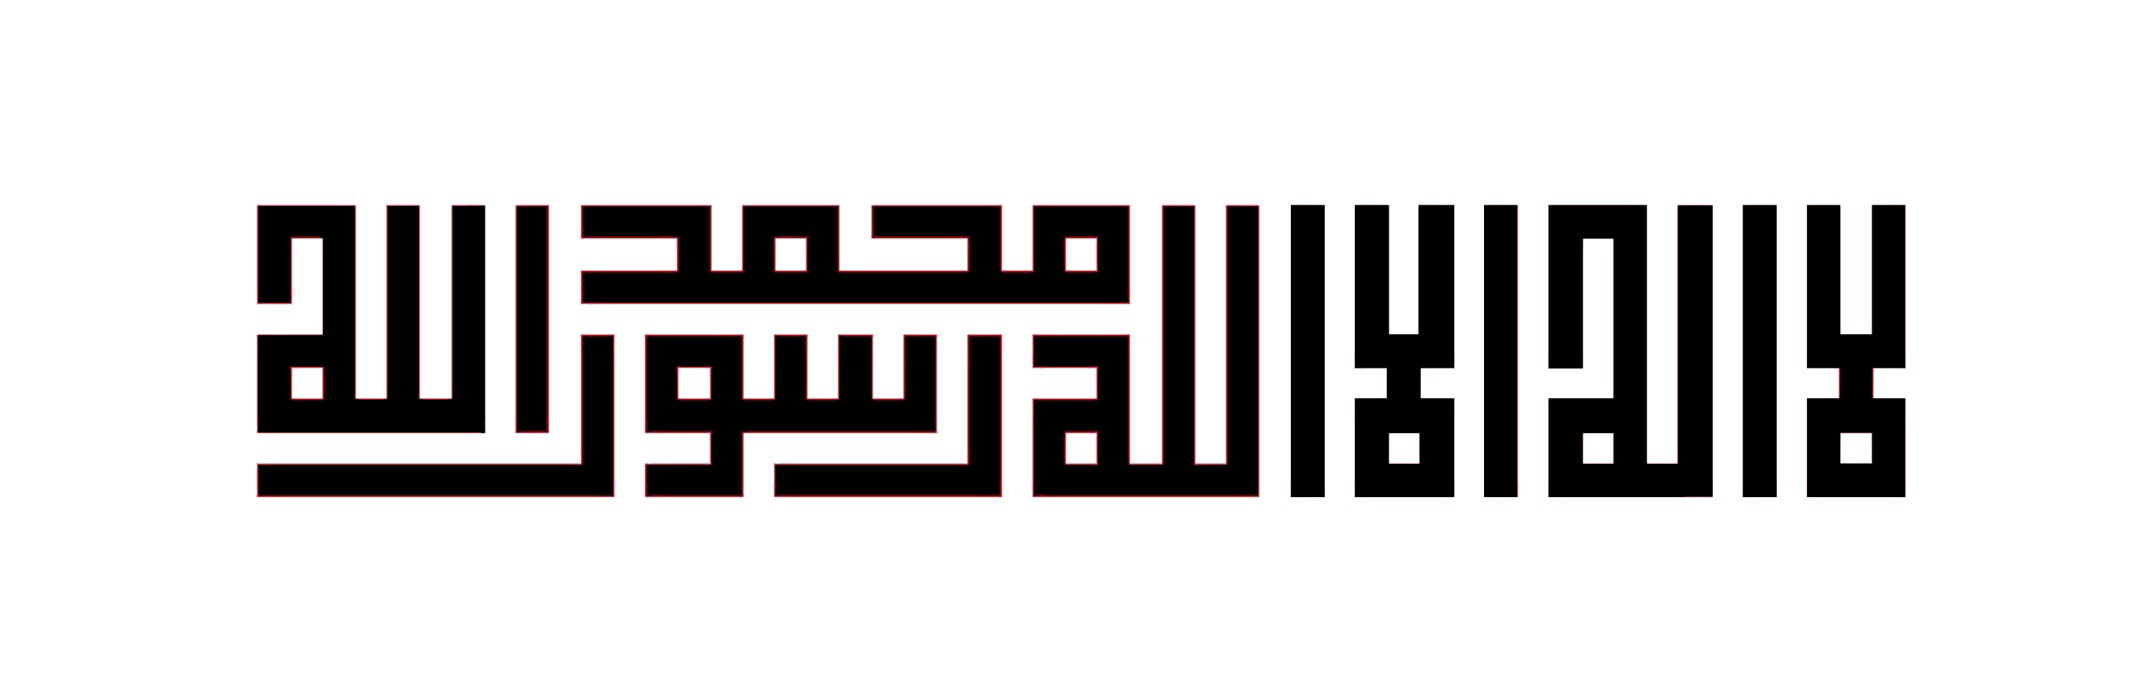 Free islamic calligraphy shahadah square kufic - La ilaha illallah hd wallpaper ...